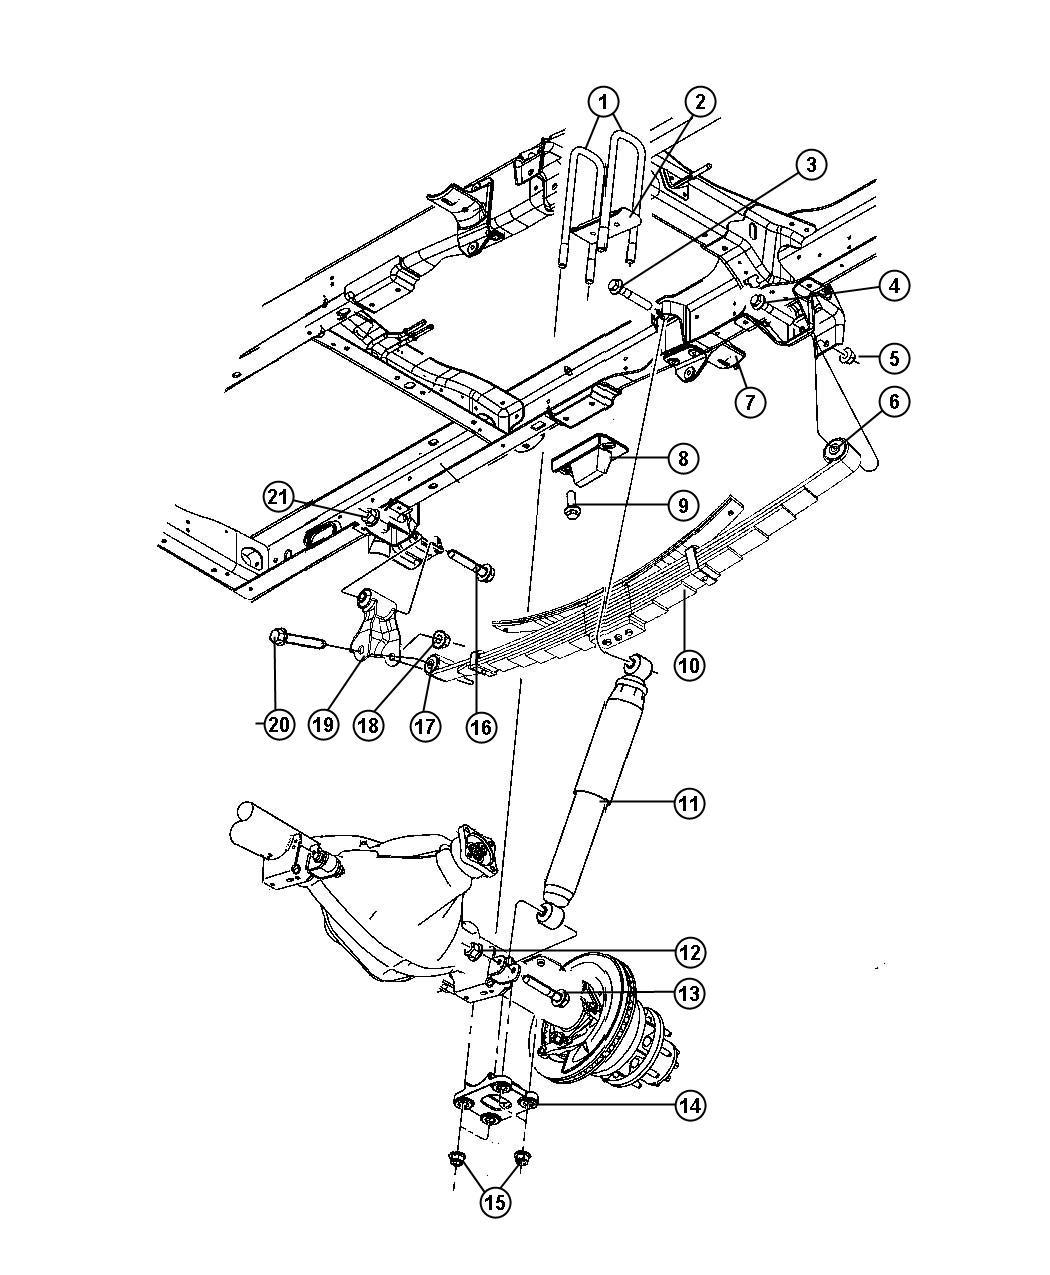 tags: #1999 dodge ram 1500 front axle diagram#99 dodge ram 1500 front  suspension diagram#2004 dodge ram parts diagram#2014 ram 2500 rear  suspension